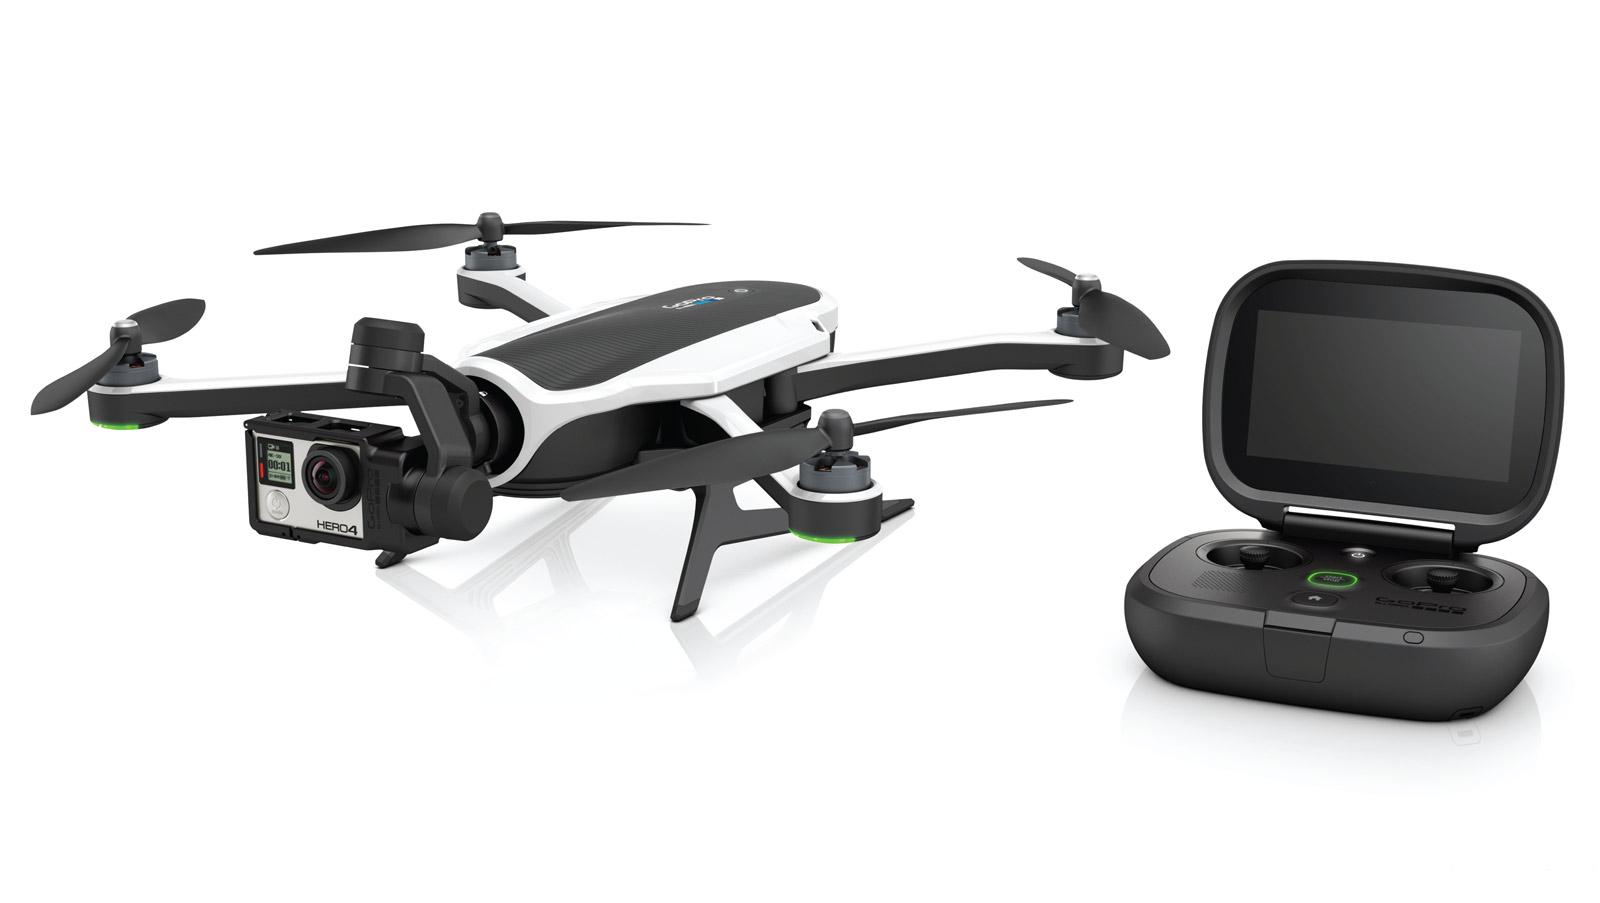 GoPro Karma Drone Announced Alongside Hero 5 Camera